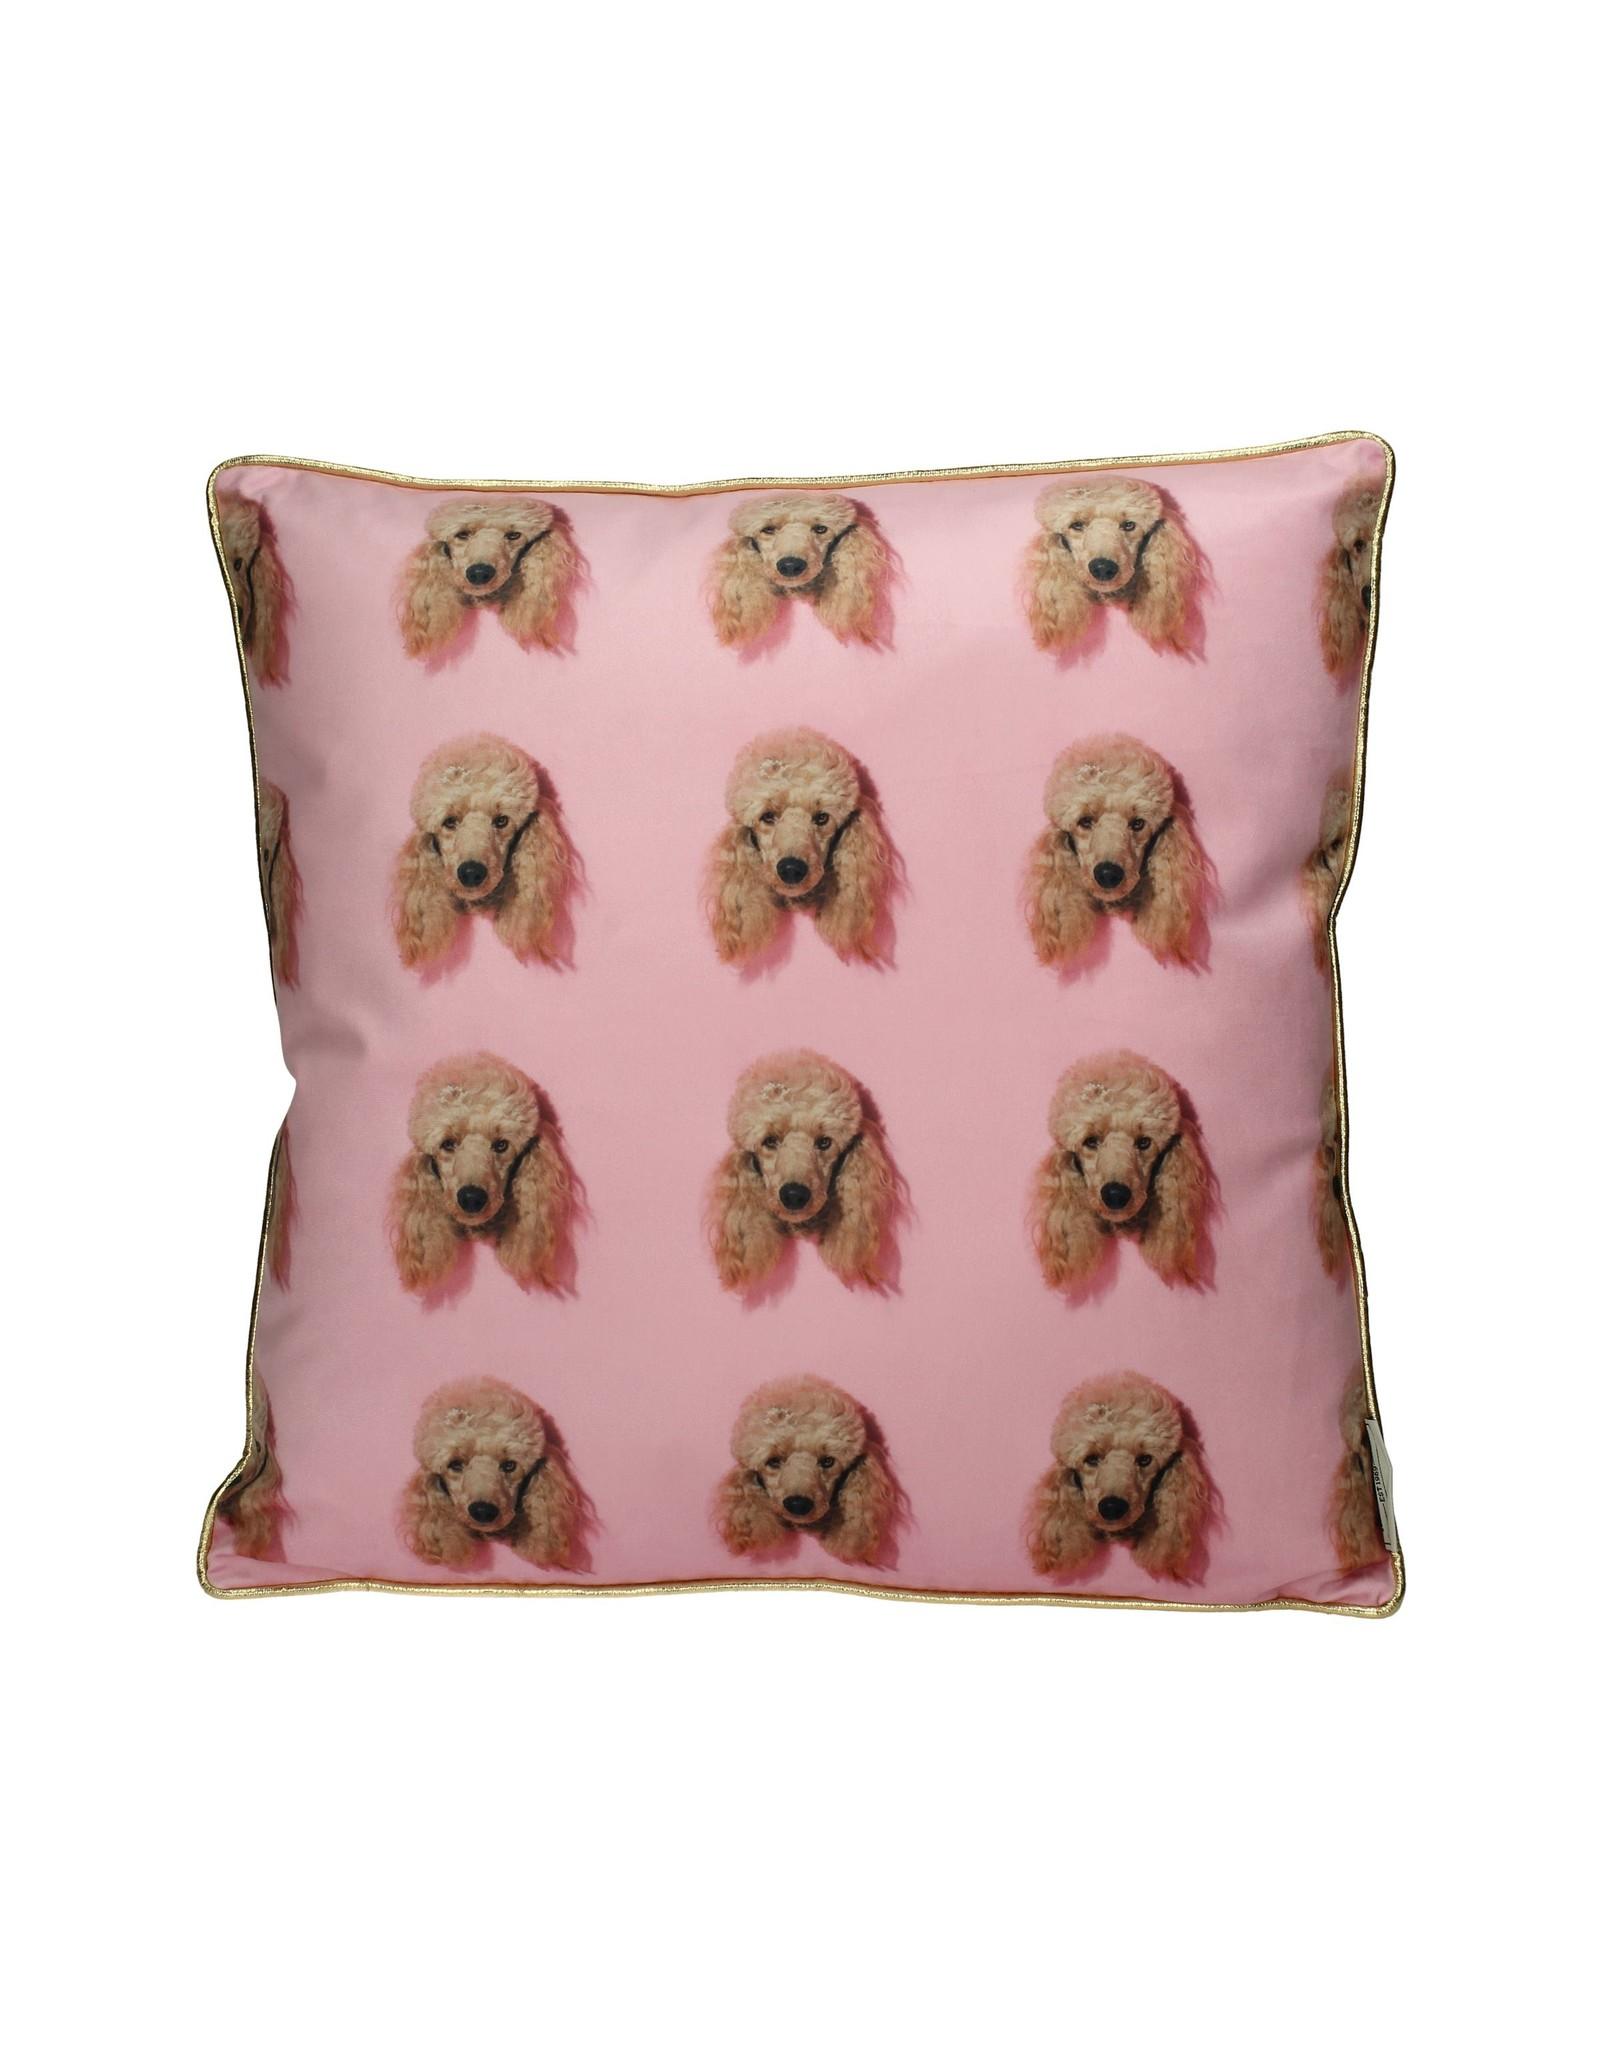 LOFT030 Sierkussen Poodle Pink 45x45cm